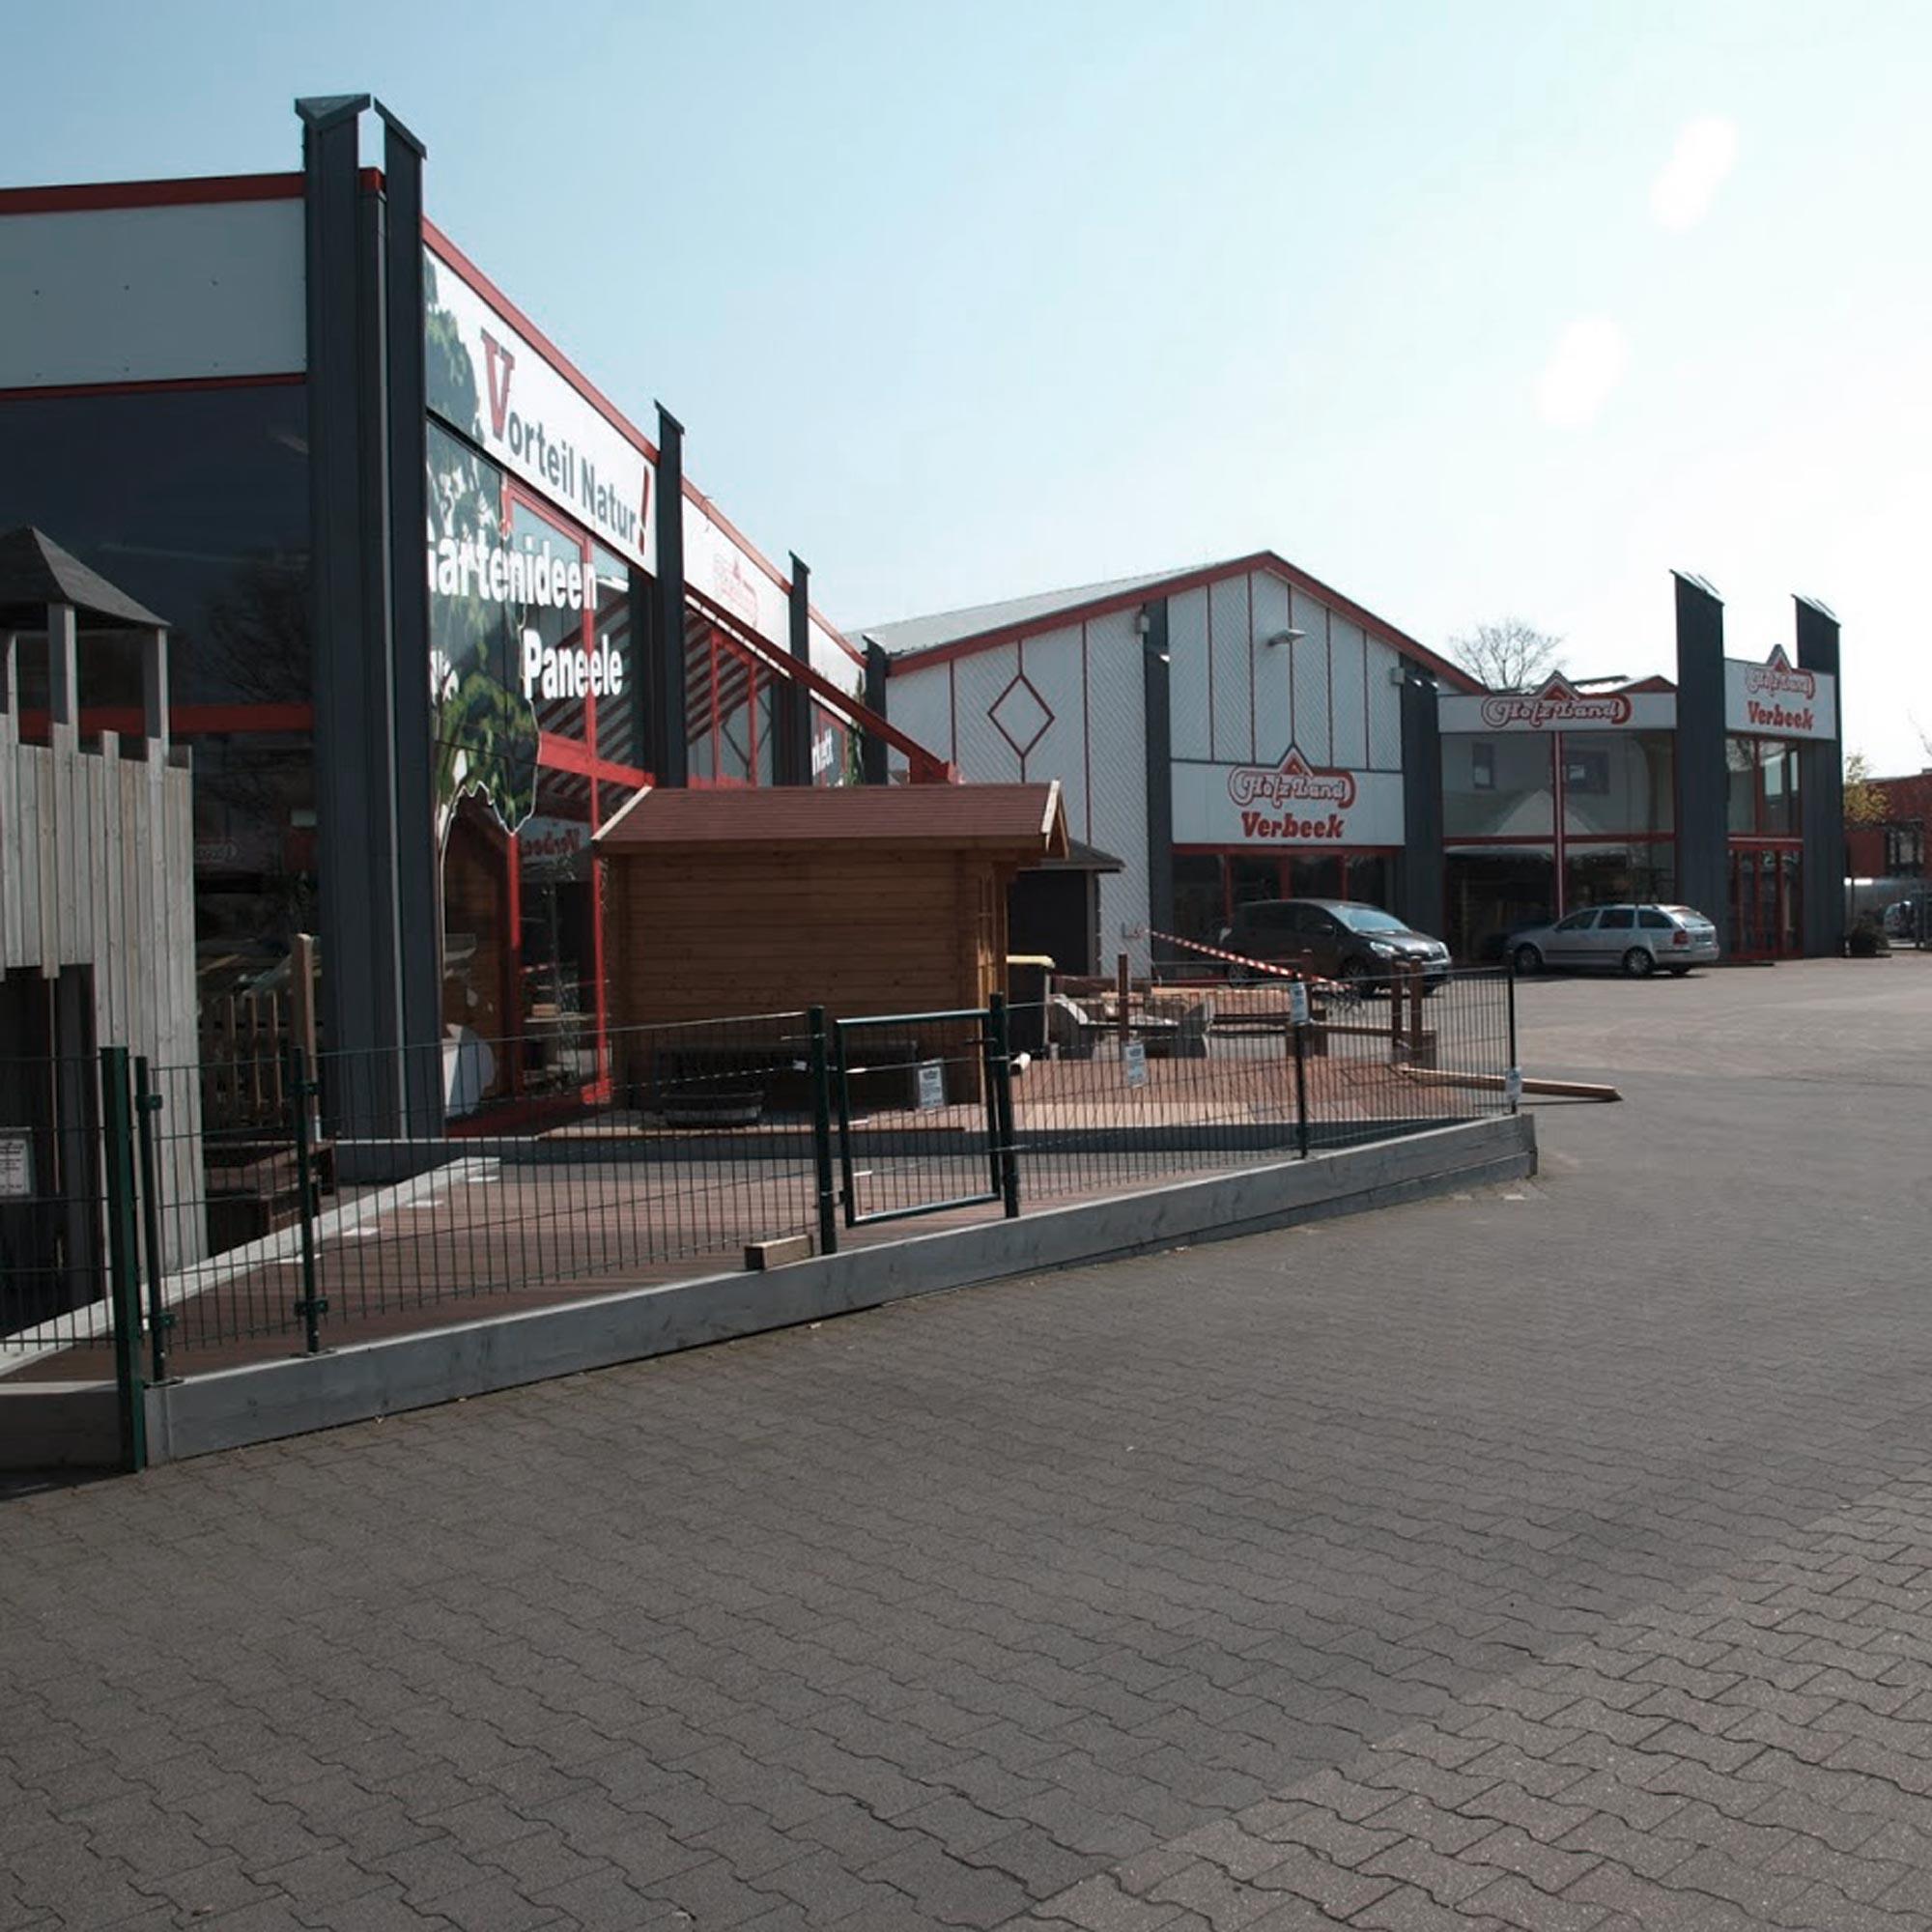 Parkplatz HolzLand Verbeek in Straelen